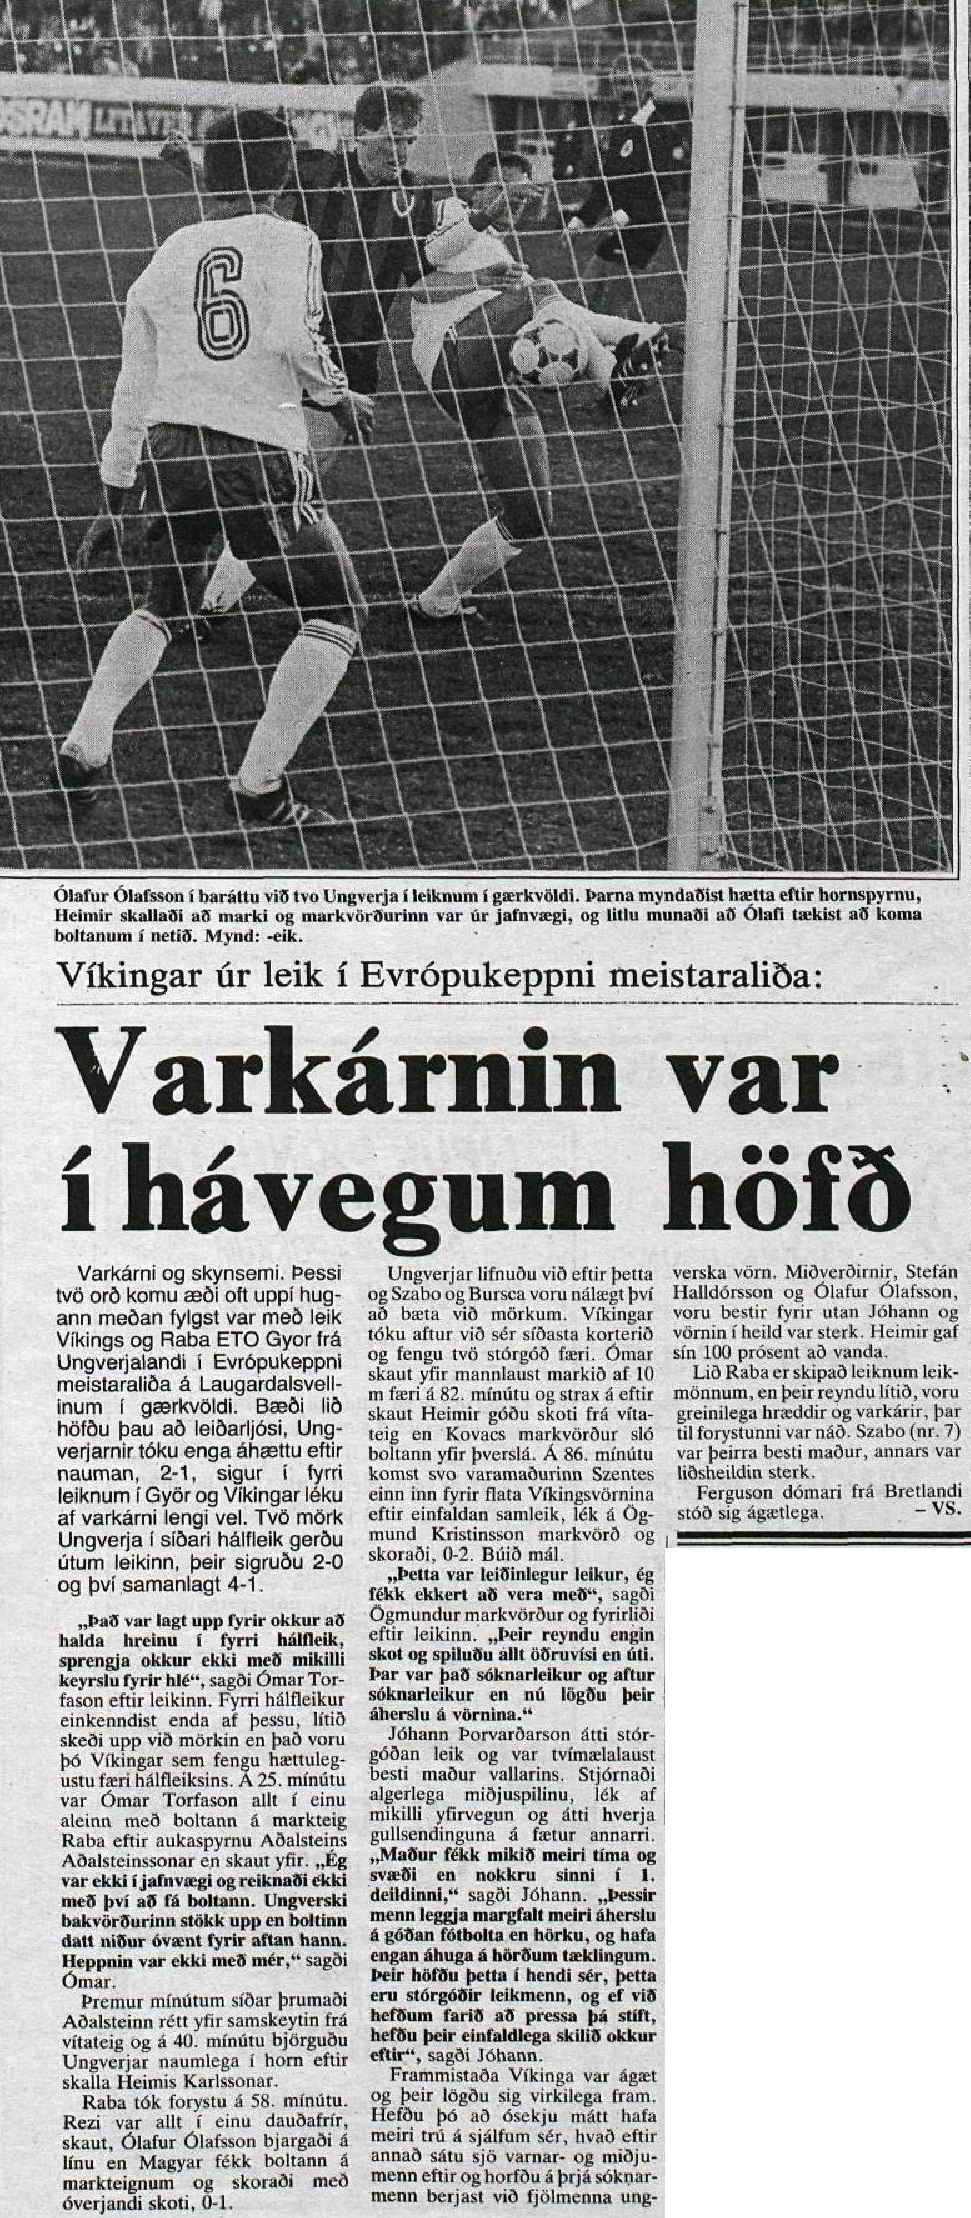 idokapszula_nb_i_1983_84_klubcsapataink_nemzetkozi_kupaszereplese_1_fordulo_2_kor_vikingur_reykjavik_raba_eto_ujsagcikk.jpg